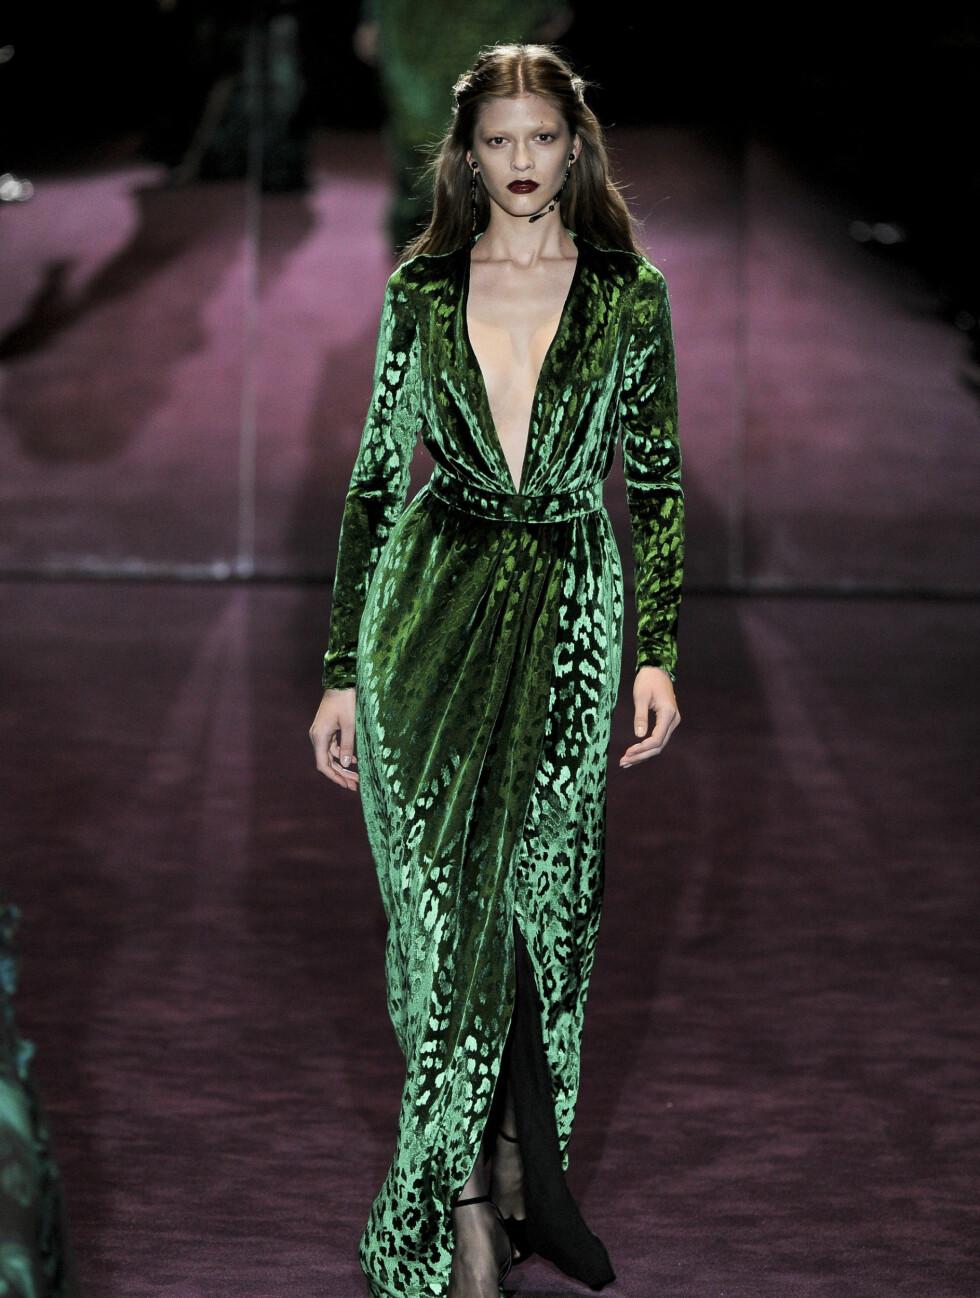 CATWALK: Gucci viste frem den flaskegrønne kreasjonen på catwalken under moteuka i Milano i februar i år. Foto: Stella pictures